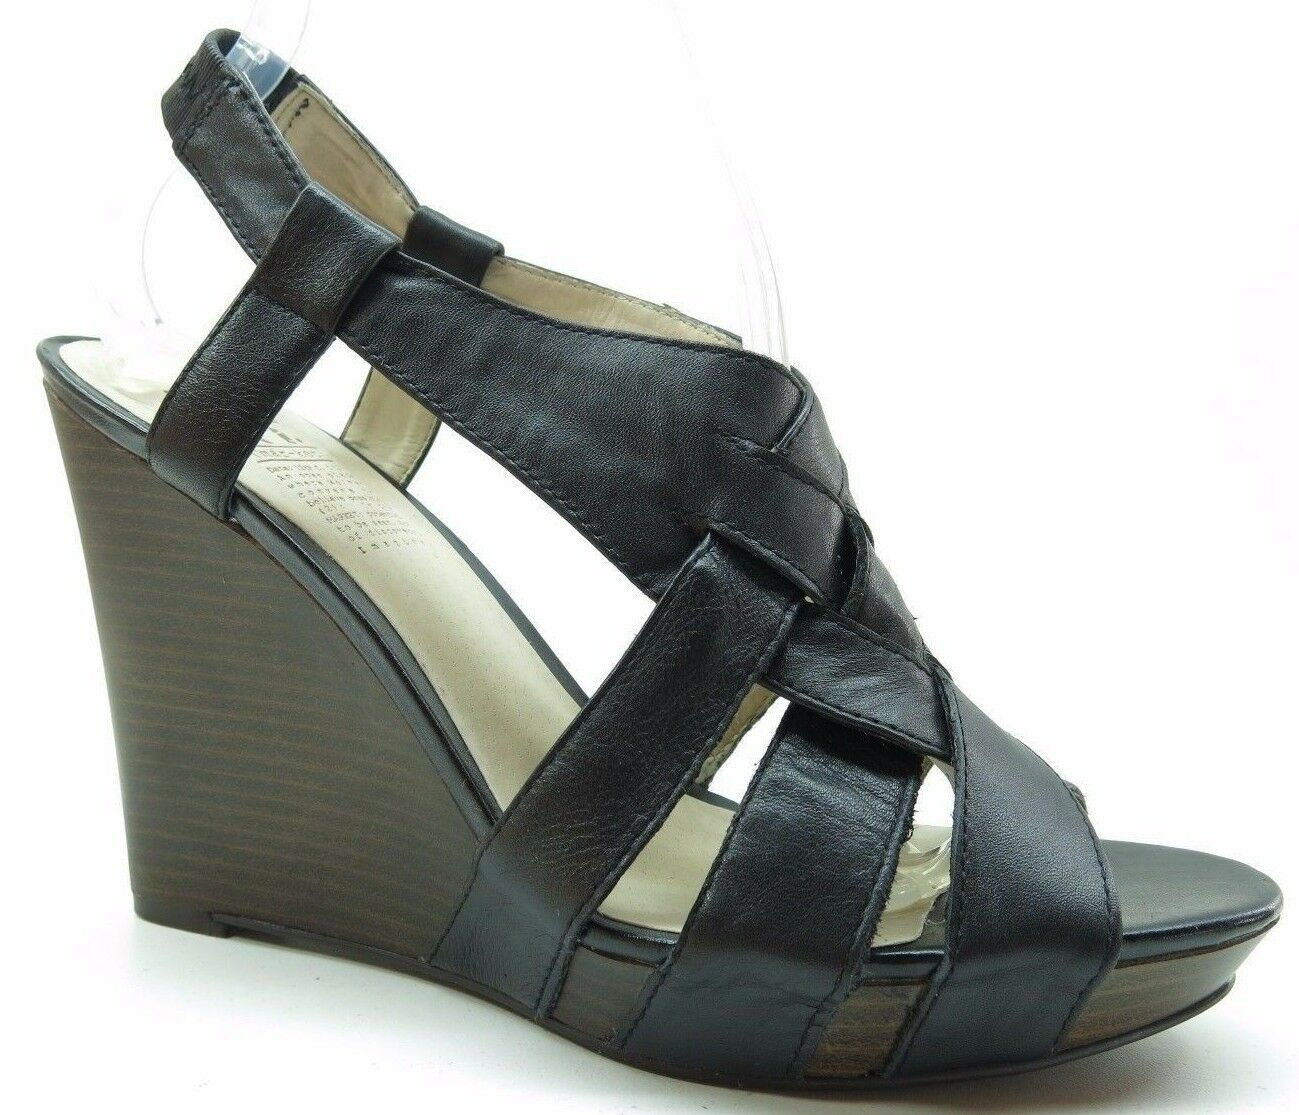 MRKT Clay Black Leather Slingback Open Toe Platform Wedge $99 Sandals Heels 9M 9 $99 Wedge 5cbaac